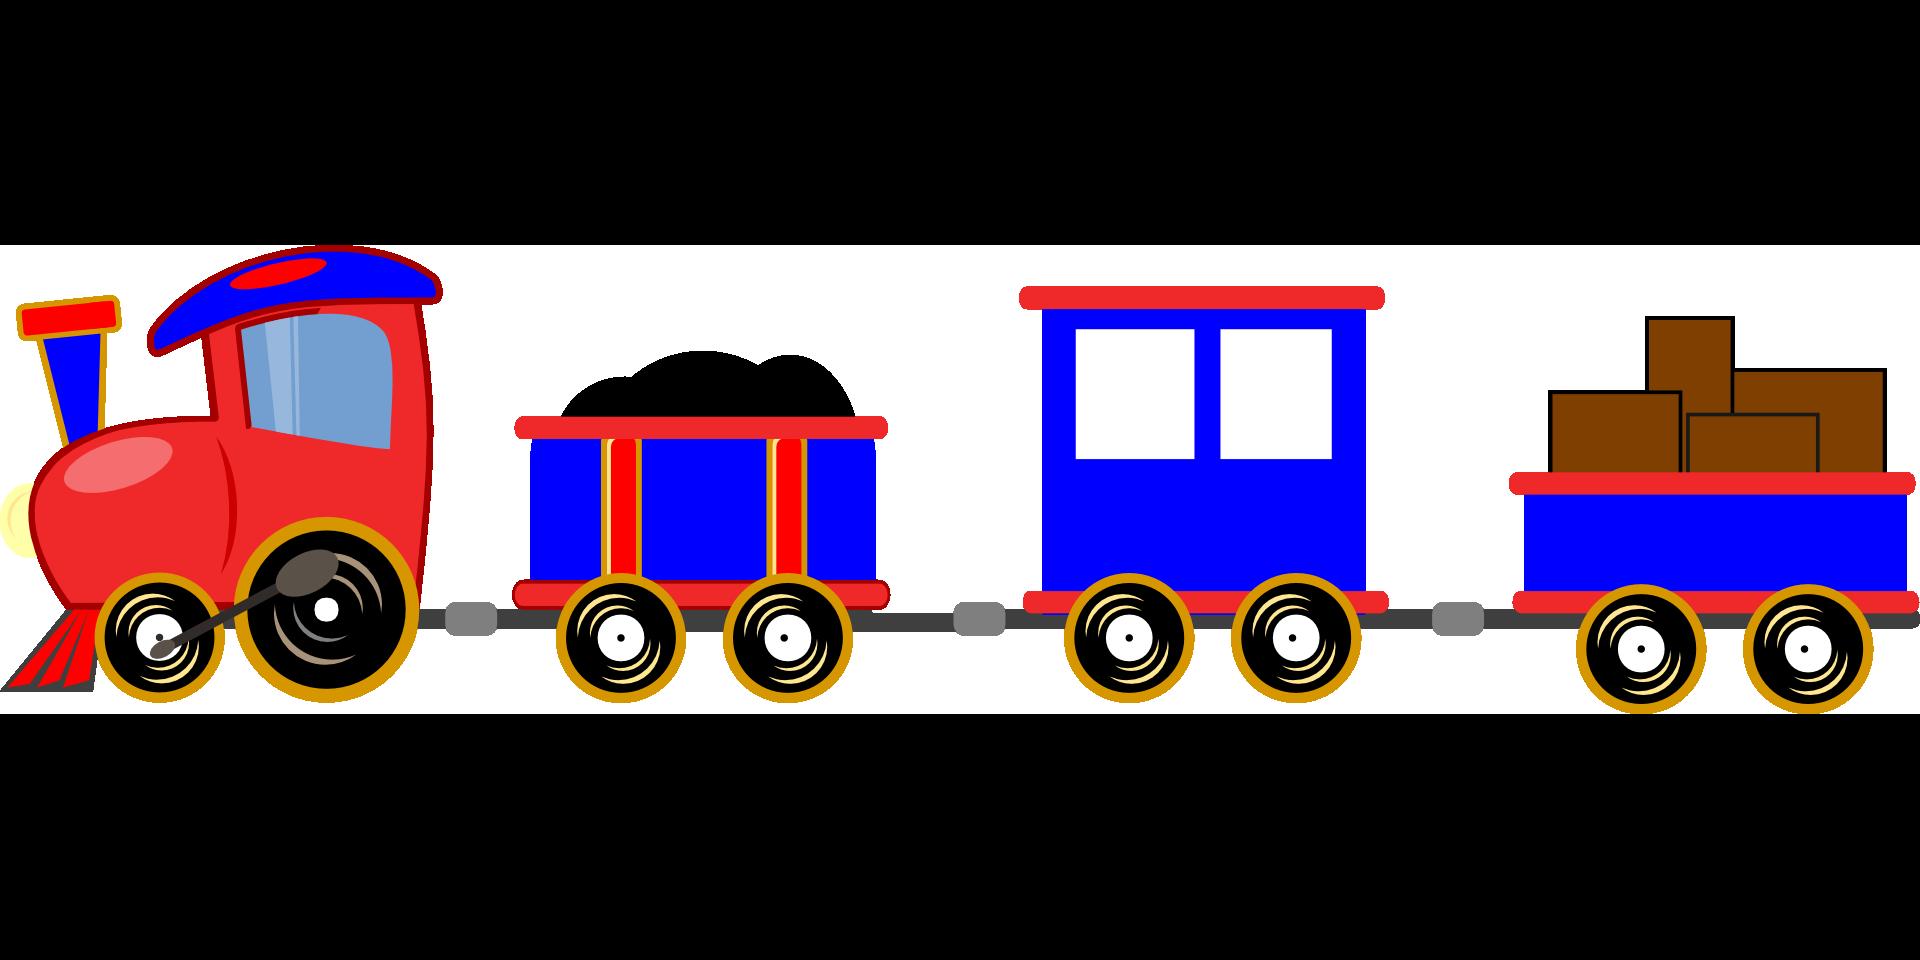 train-312107